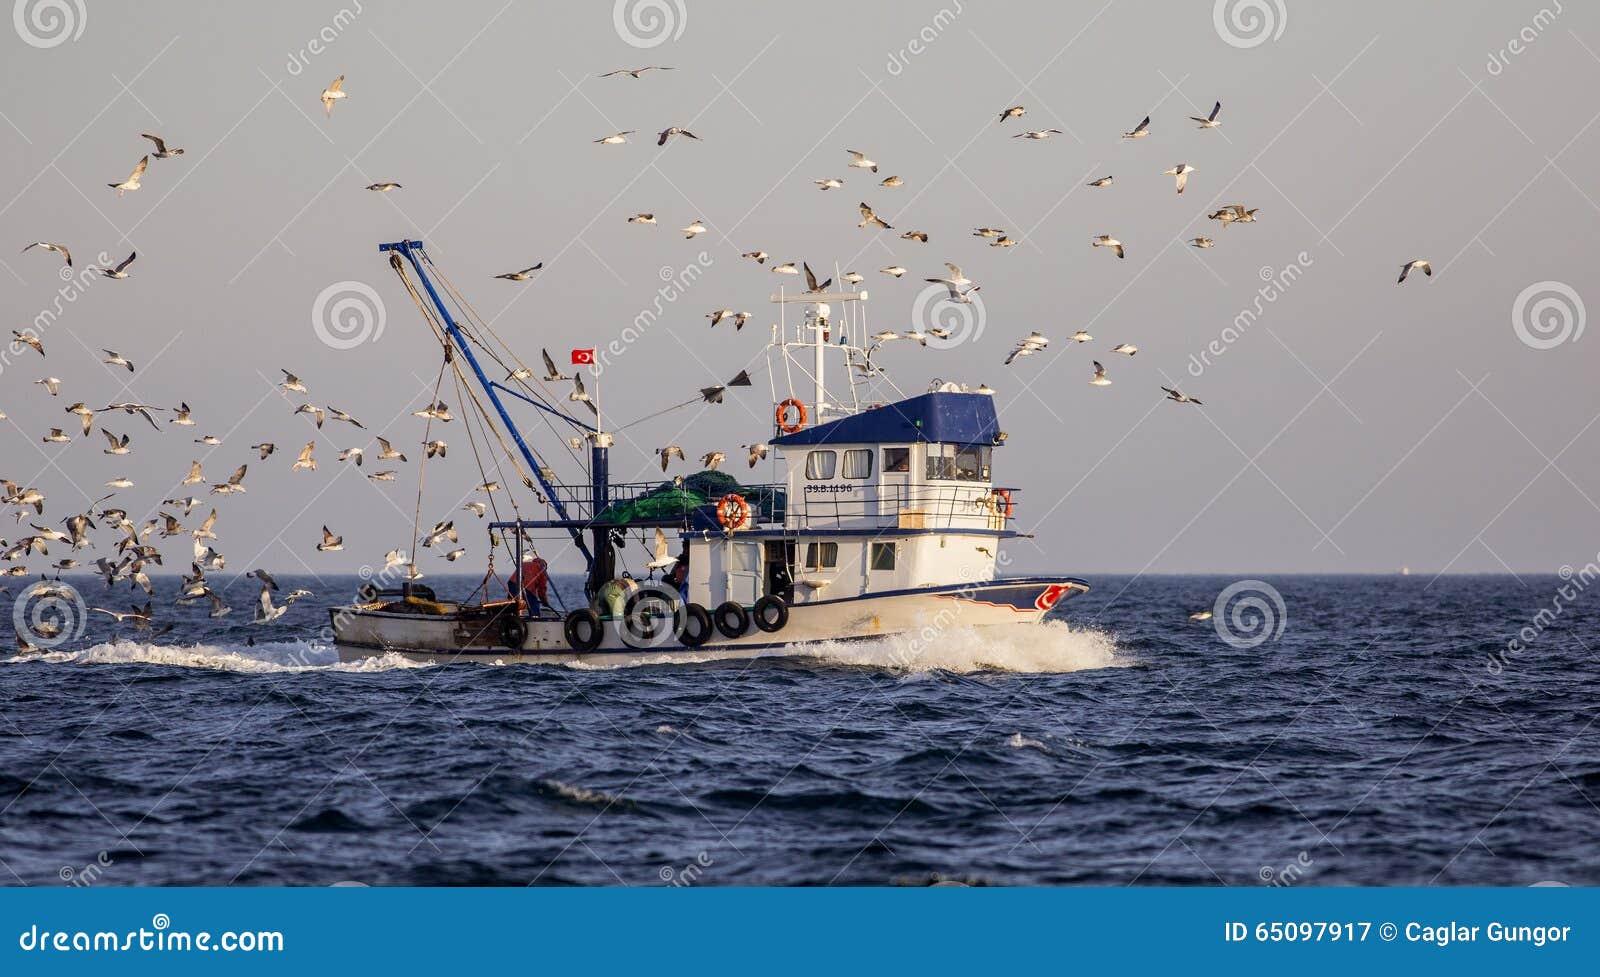 Fishing Boat with Sea Gulls